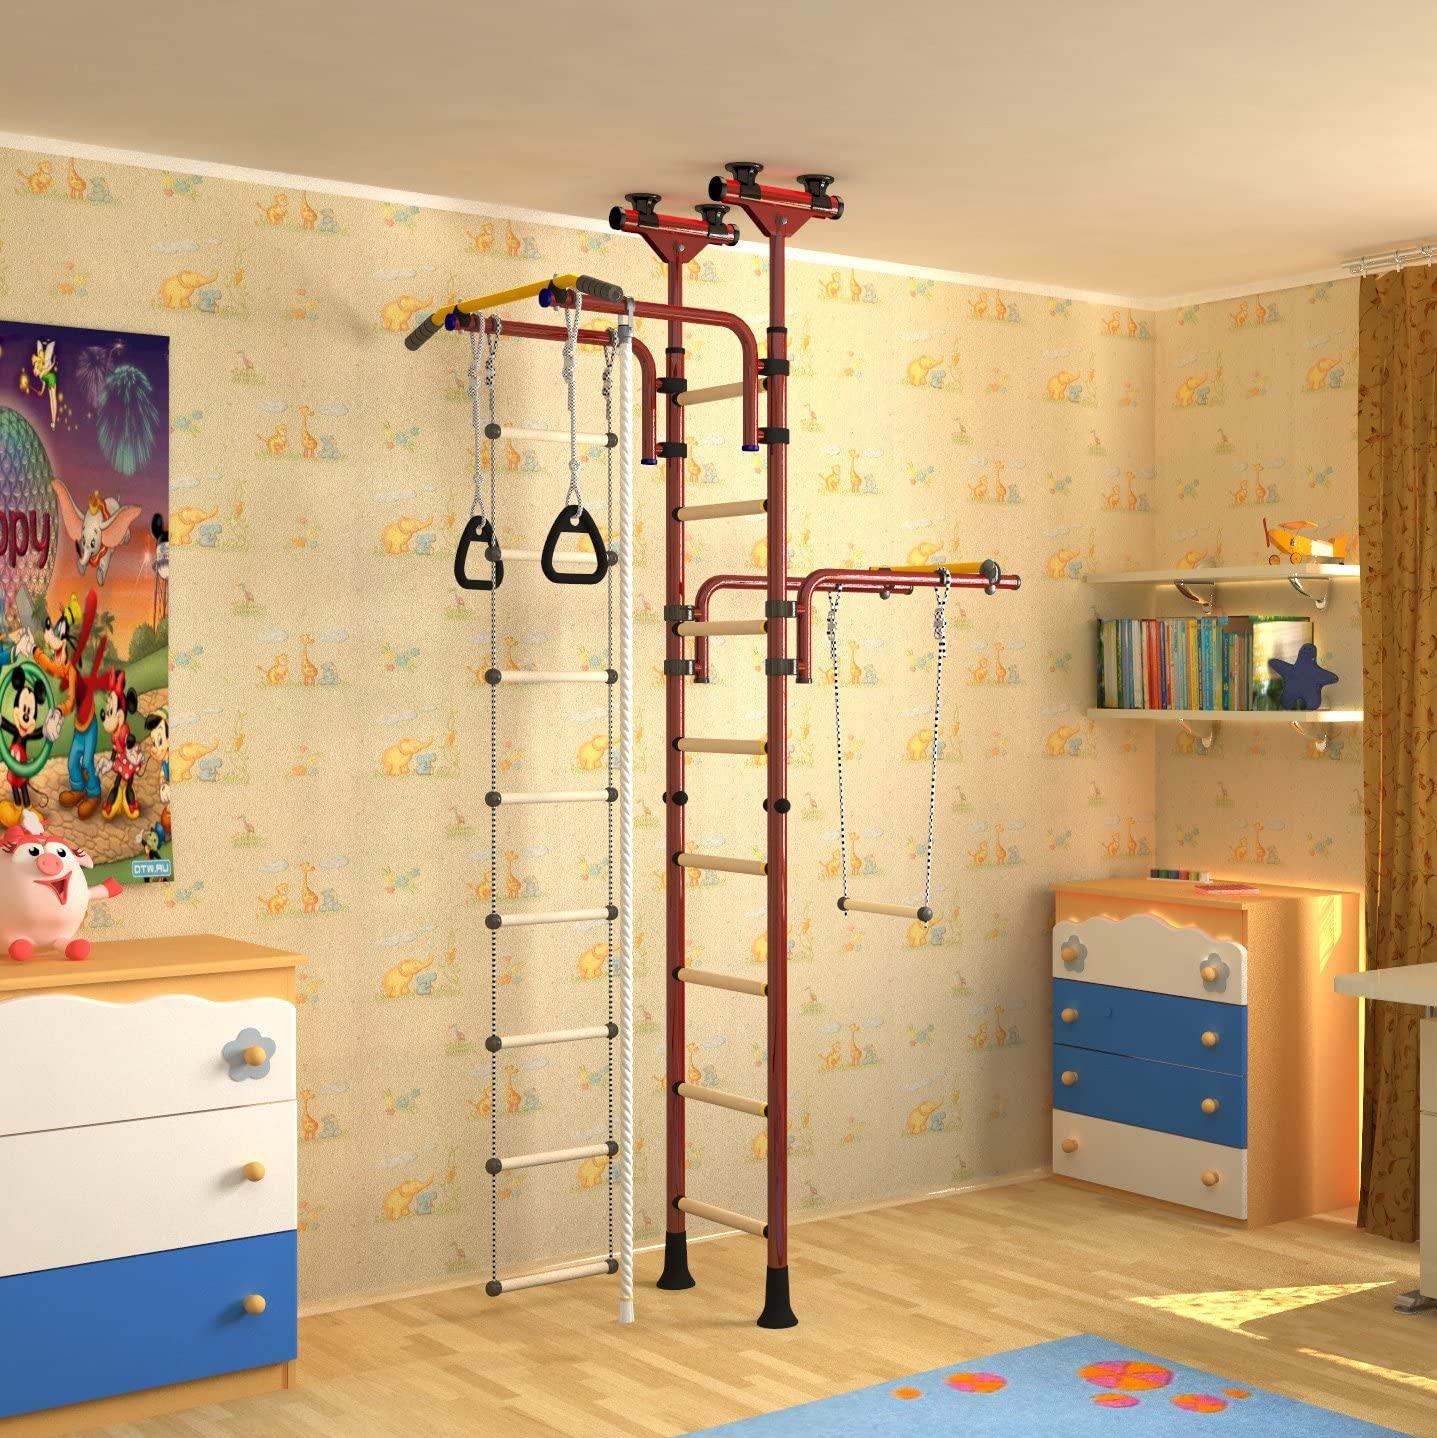 Full Size of Sprossenwand Kinderzimmer Indoor Klettergerst Fr Kinderturngert Regal Weiß Sofa Regale Kinderzimmer Sprossenwand Kinderzimmer